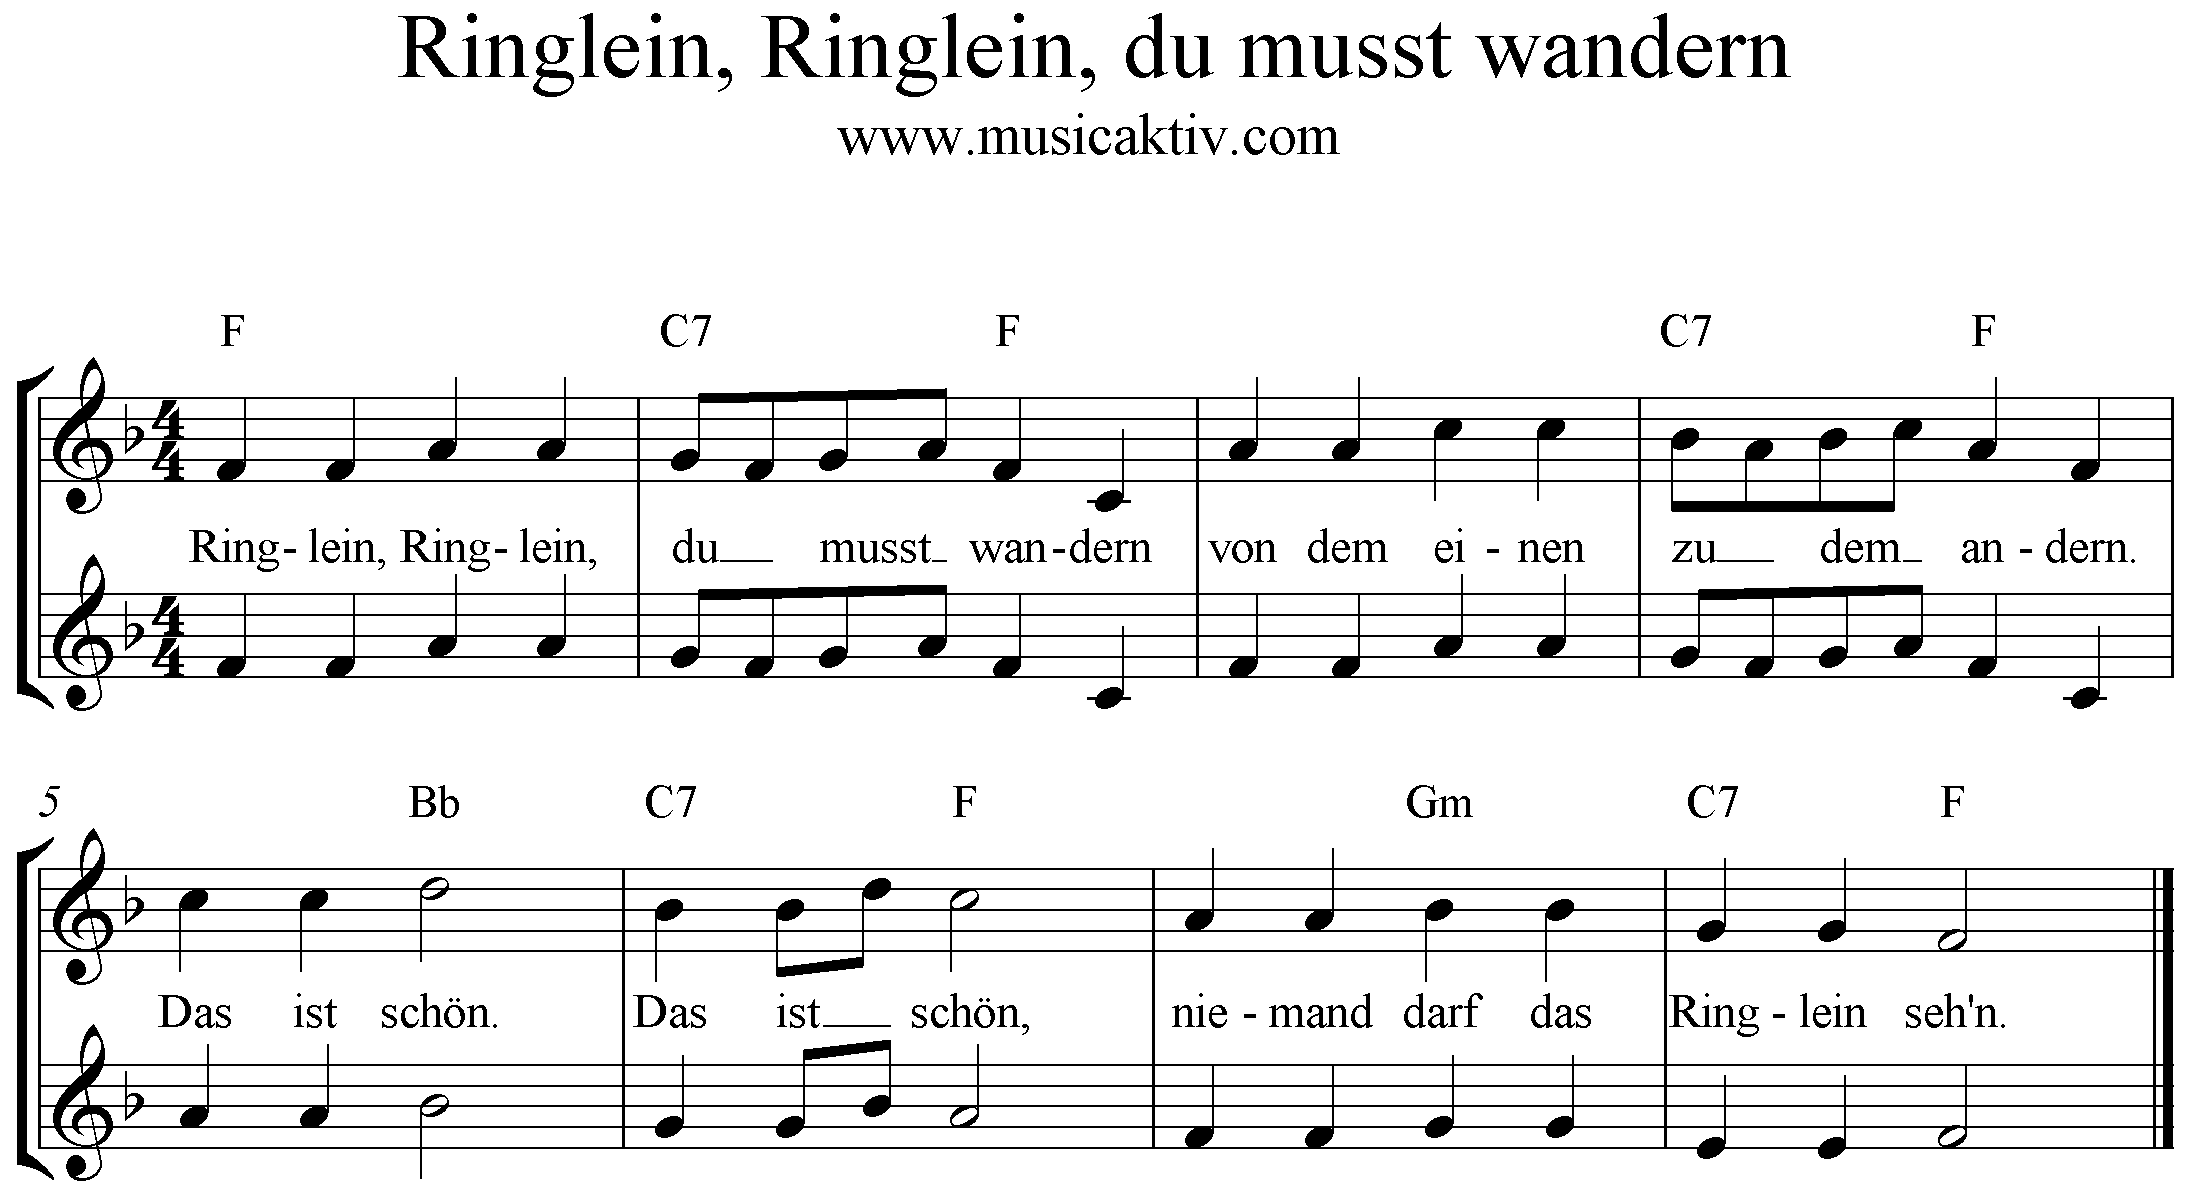 Ringlein Du Musst Wandern